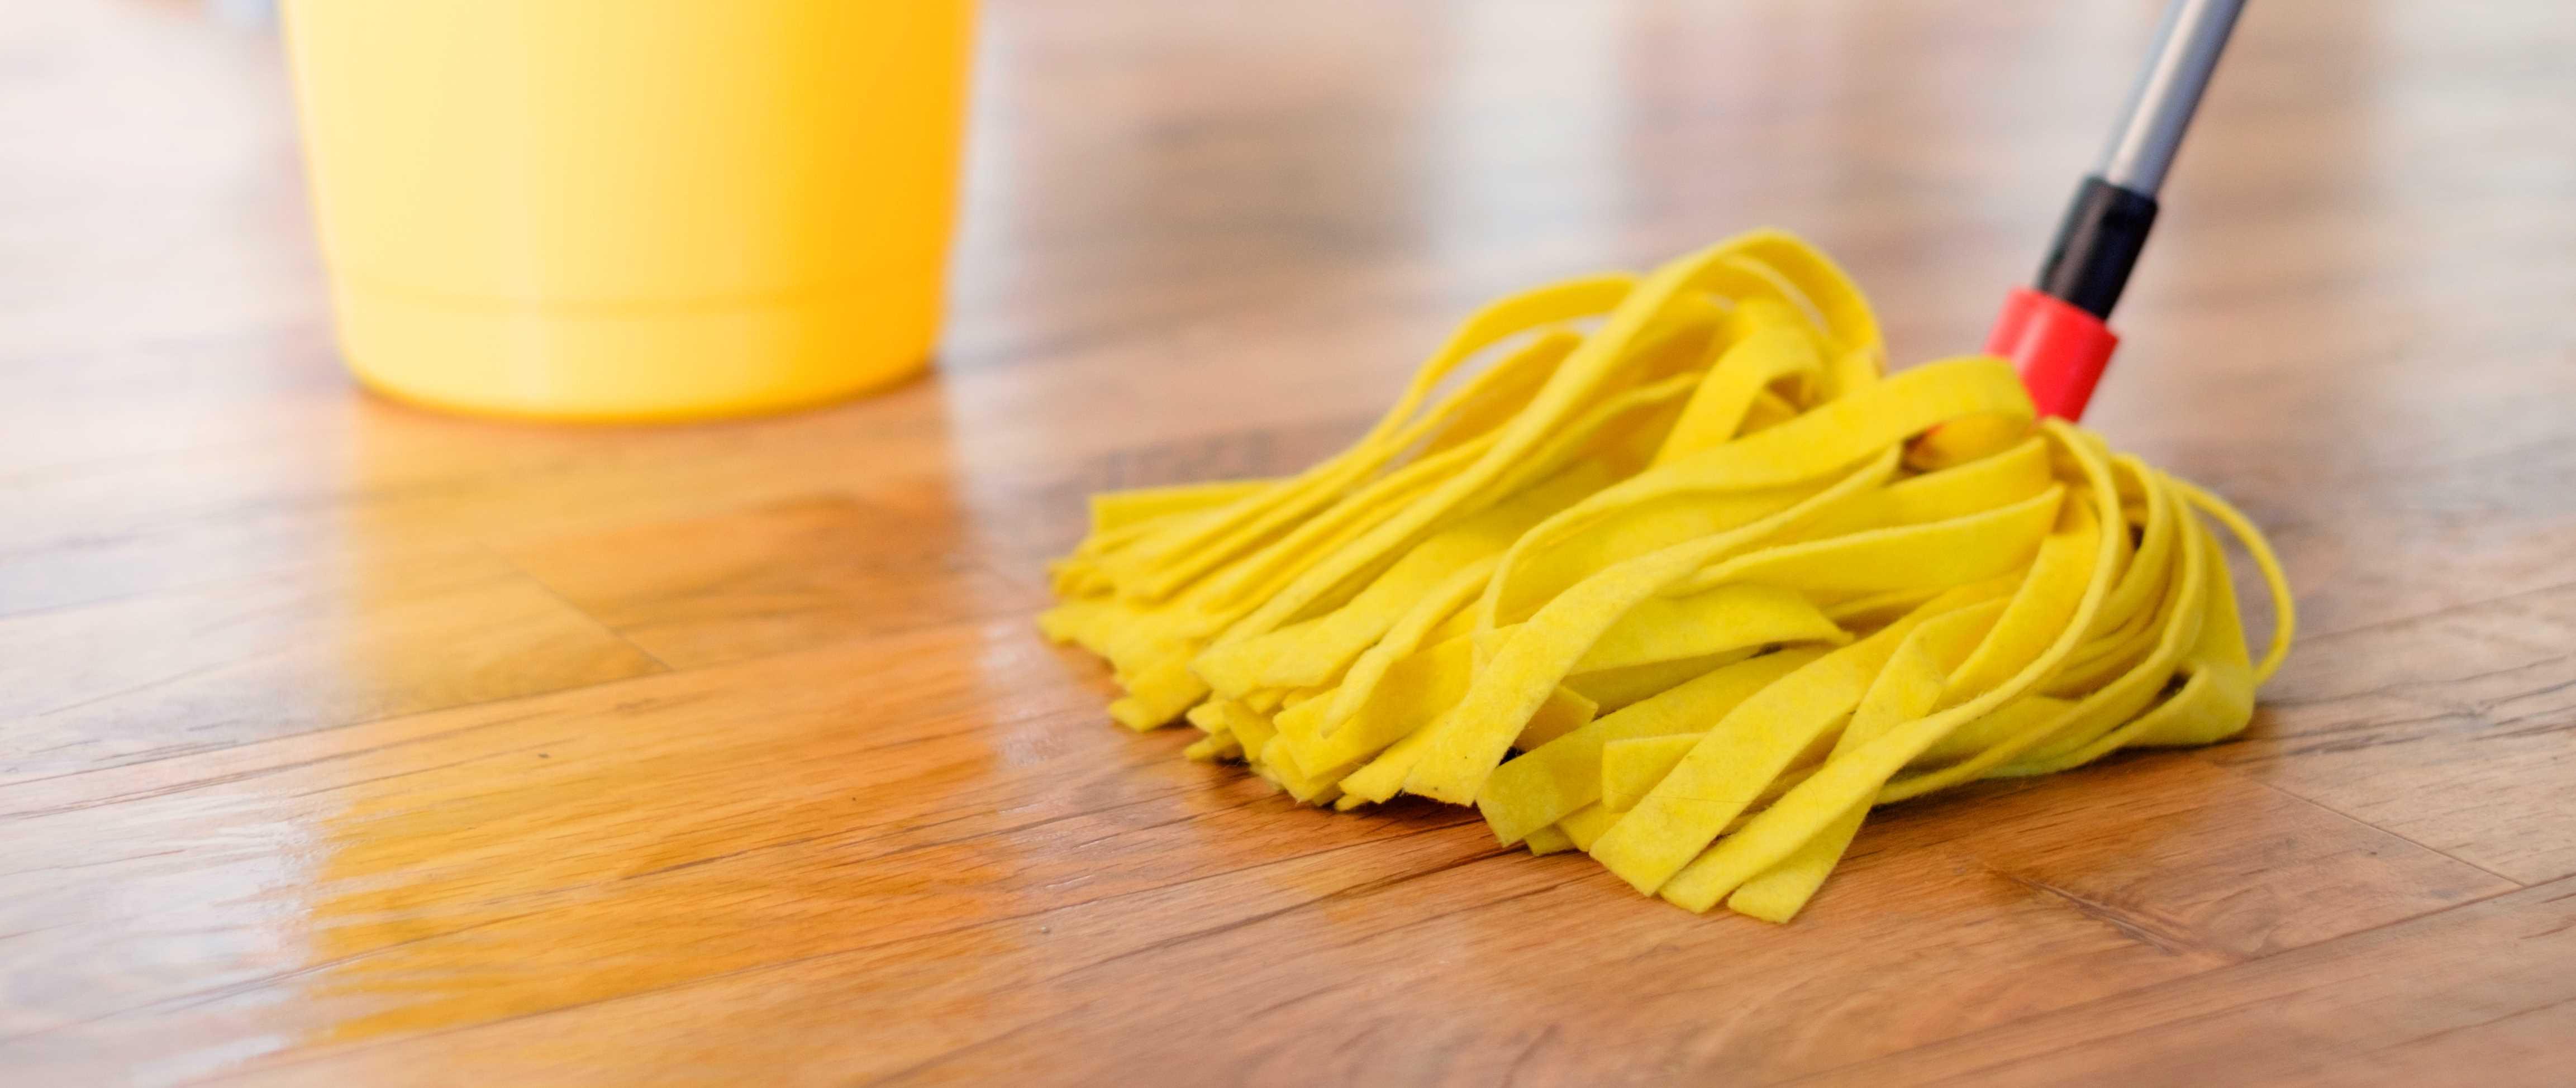 Cleaning Hardwood Floors - Floor Care in Springfield Missouri